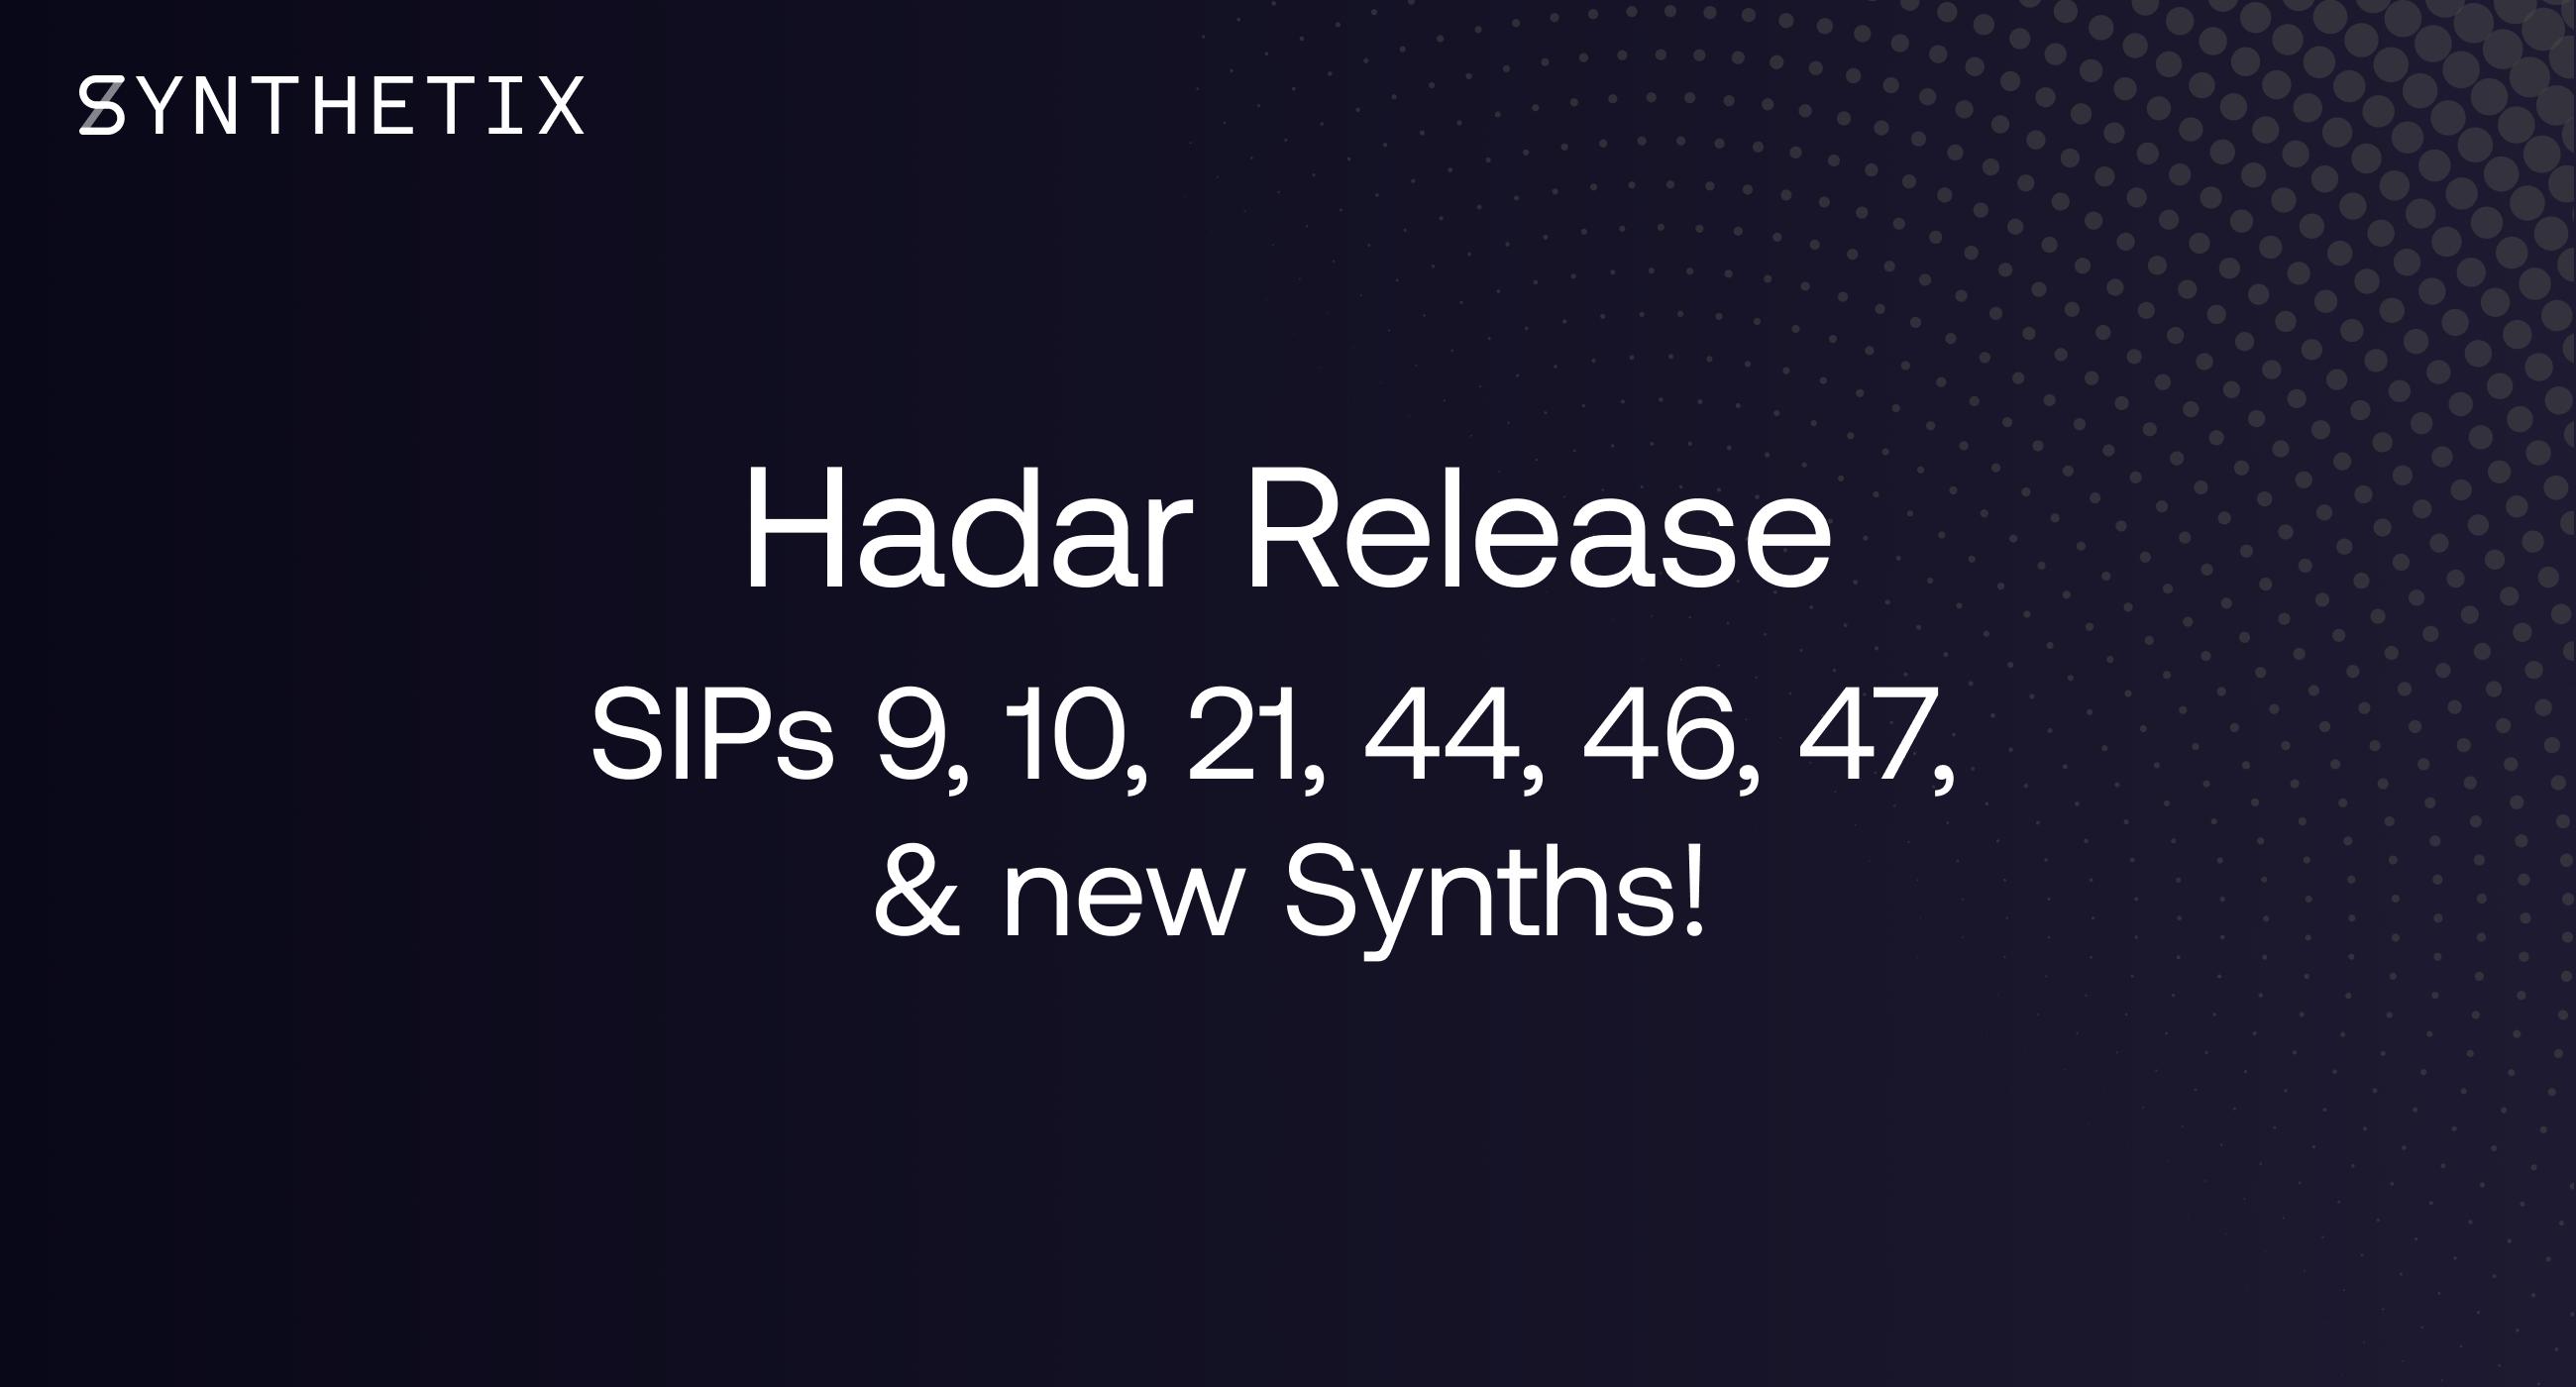 The Hadar release